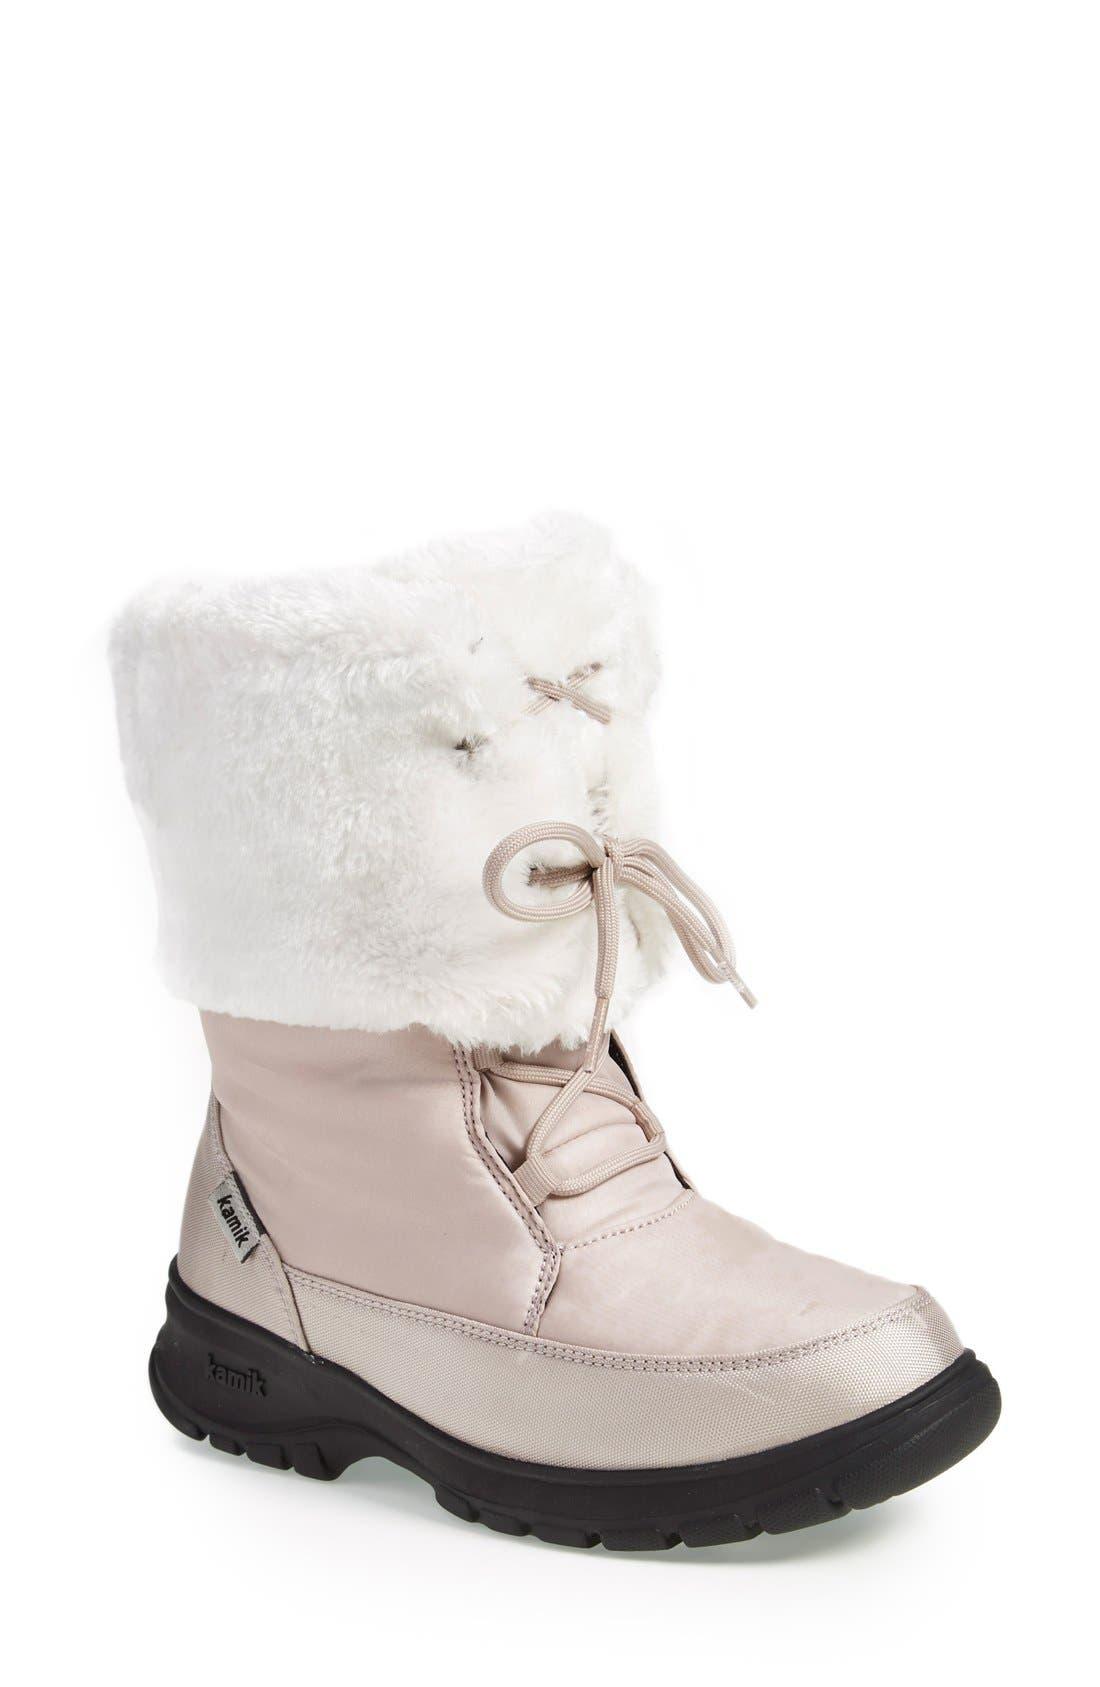 Main Image - Kamik 'Seattle' Fuzzy Boot (Women)